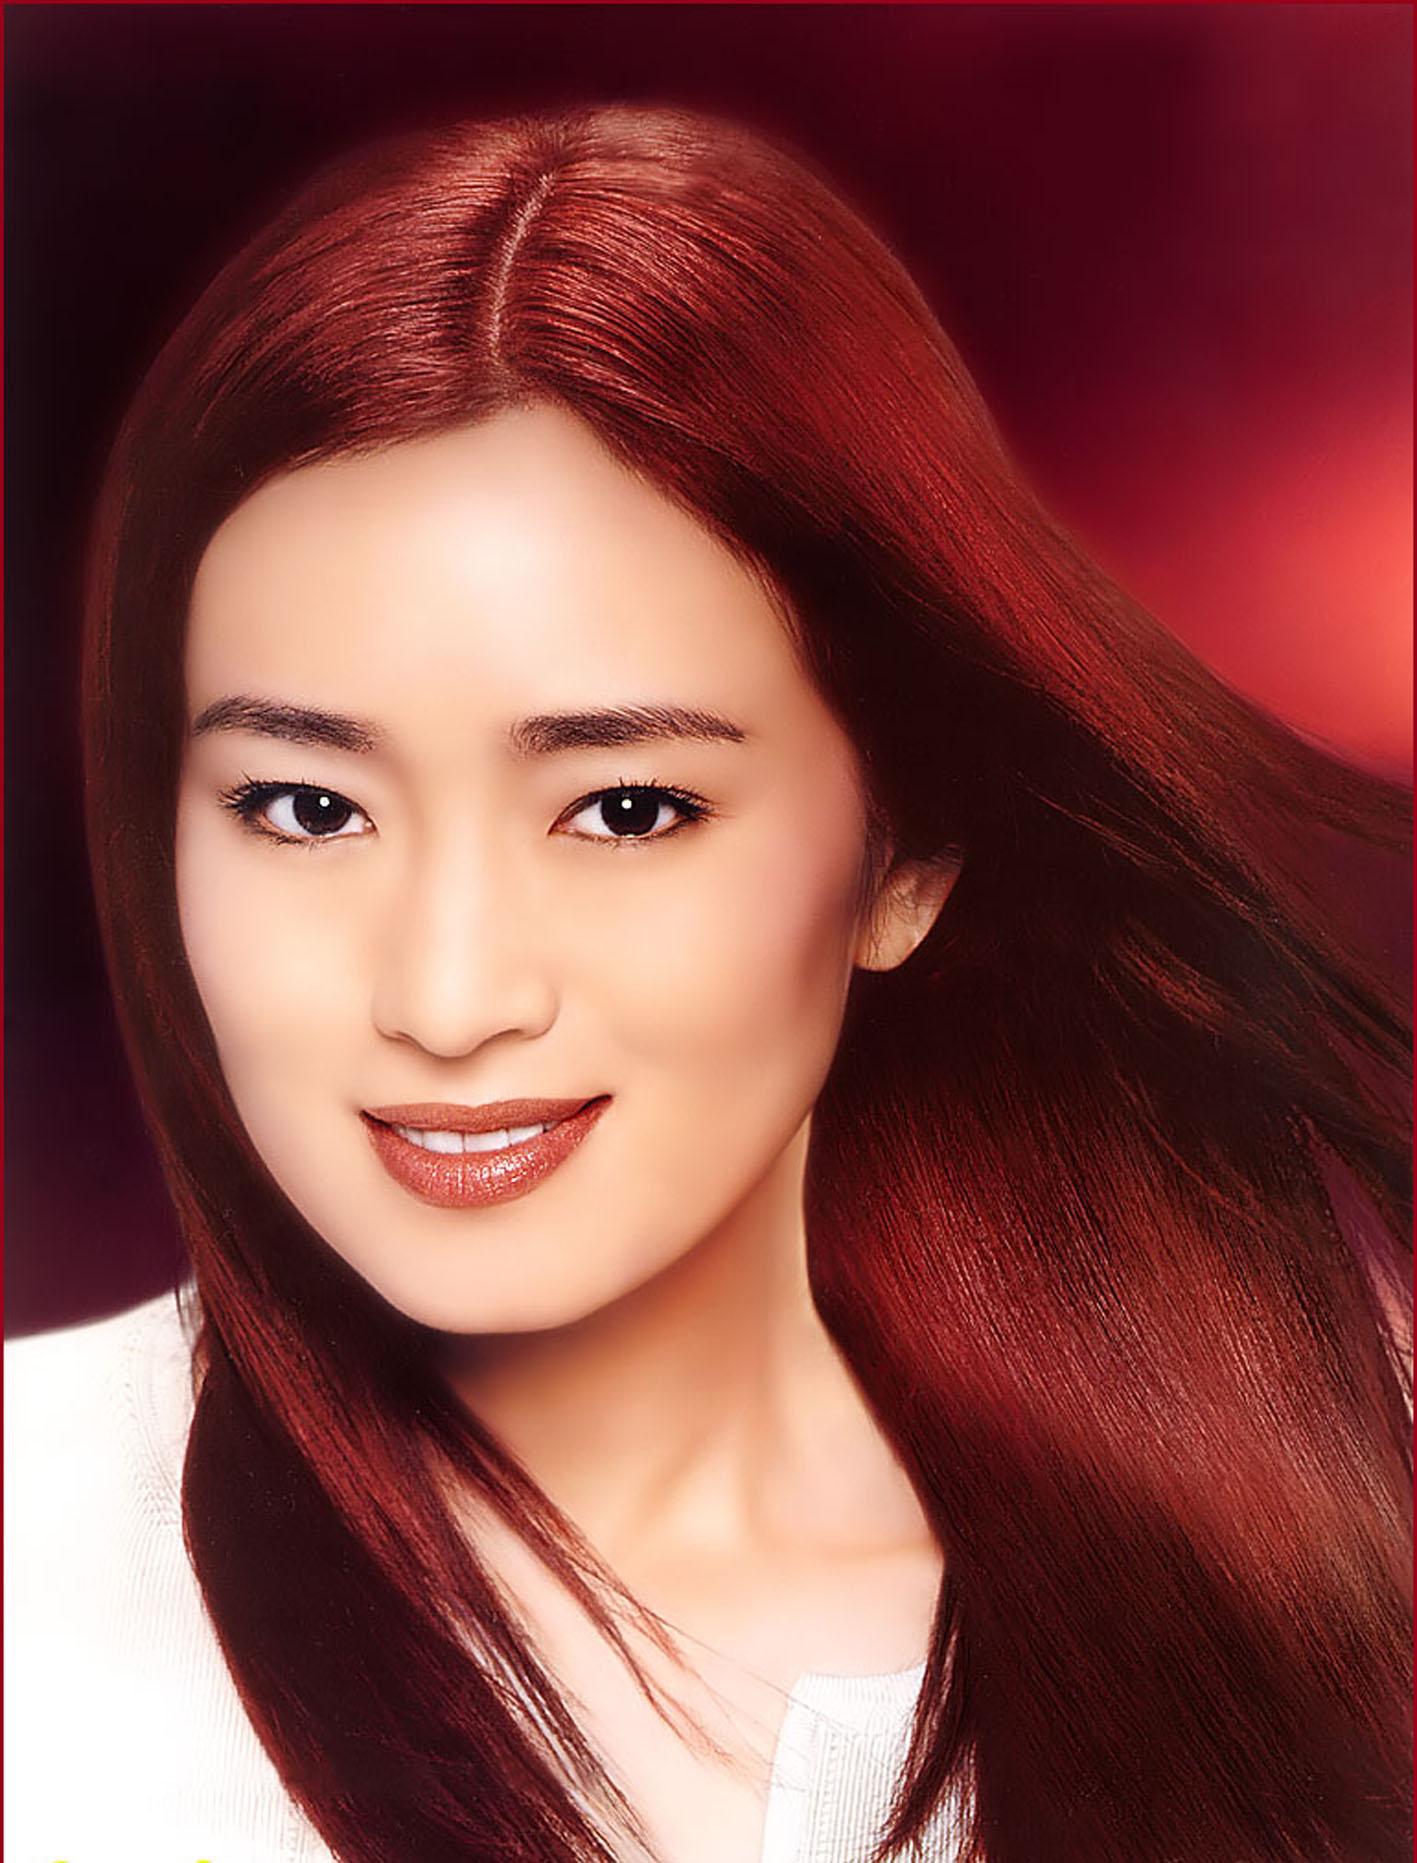 Gong Li photo gallery - 174 best Gong Li pics | Celebs